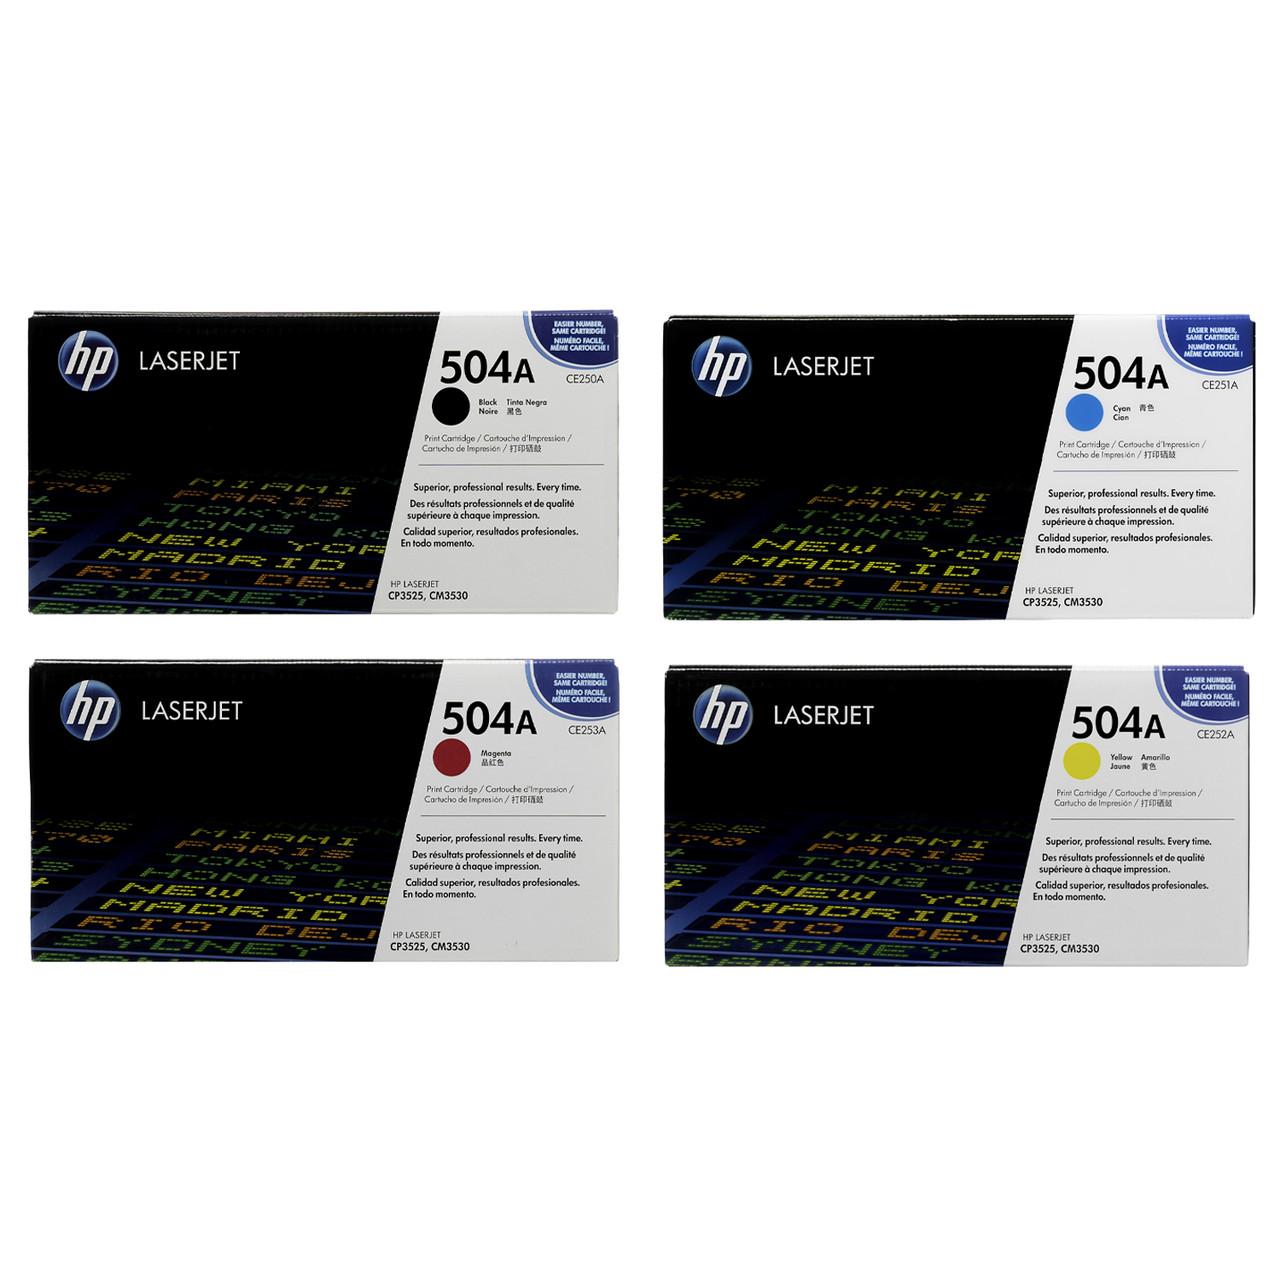 HP Laserjet CE251A 504A Cyan Toner CP3525 CM3530 Genuine OEM NEW FREE SHIPPING